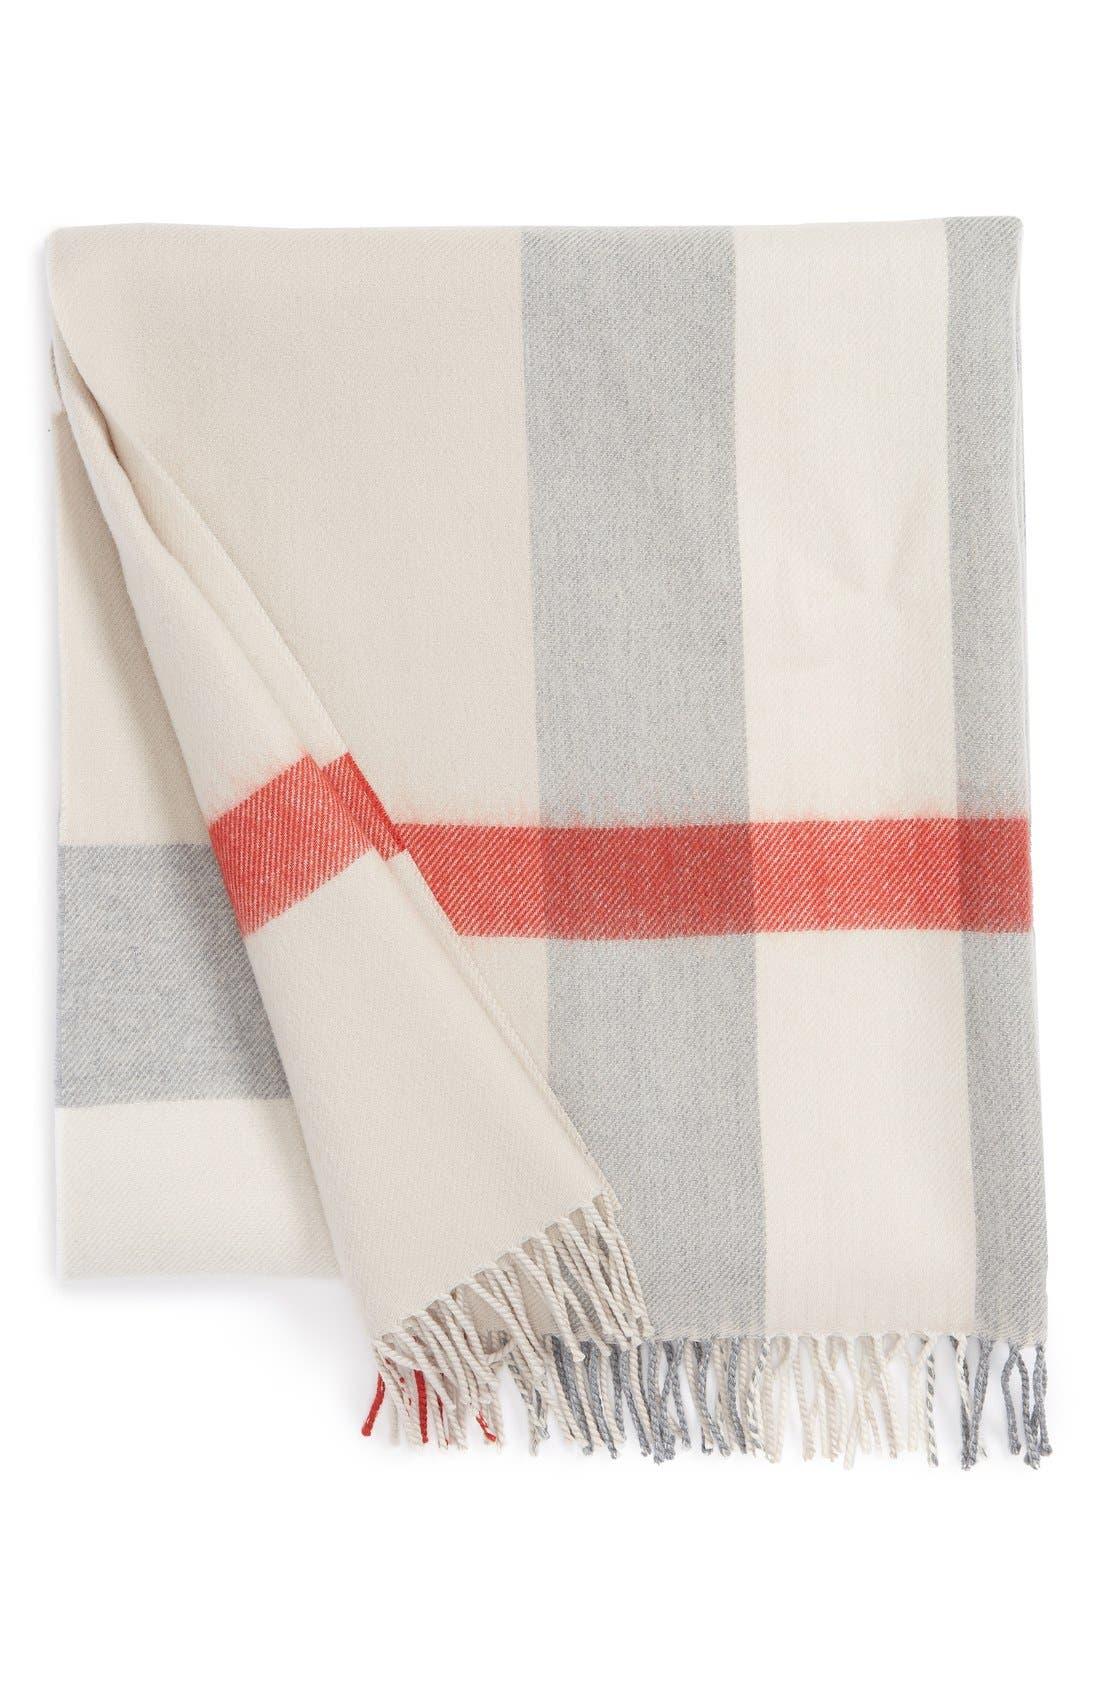 Merino Wool Baby Blanket,                             Main thumbnail 1, color,                             Heritage Stone